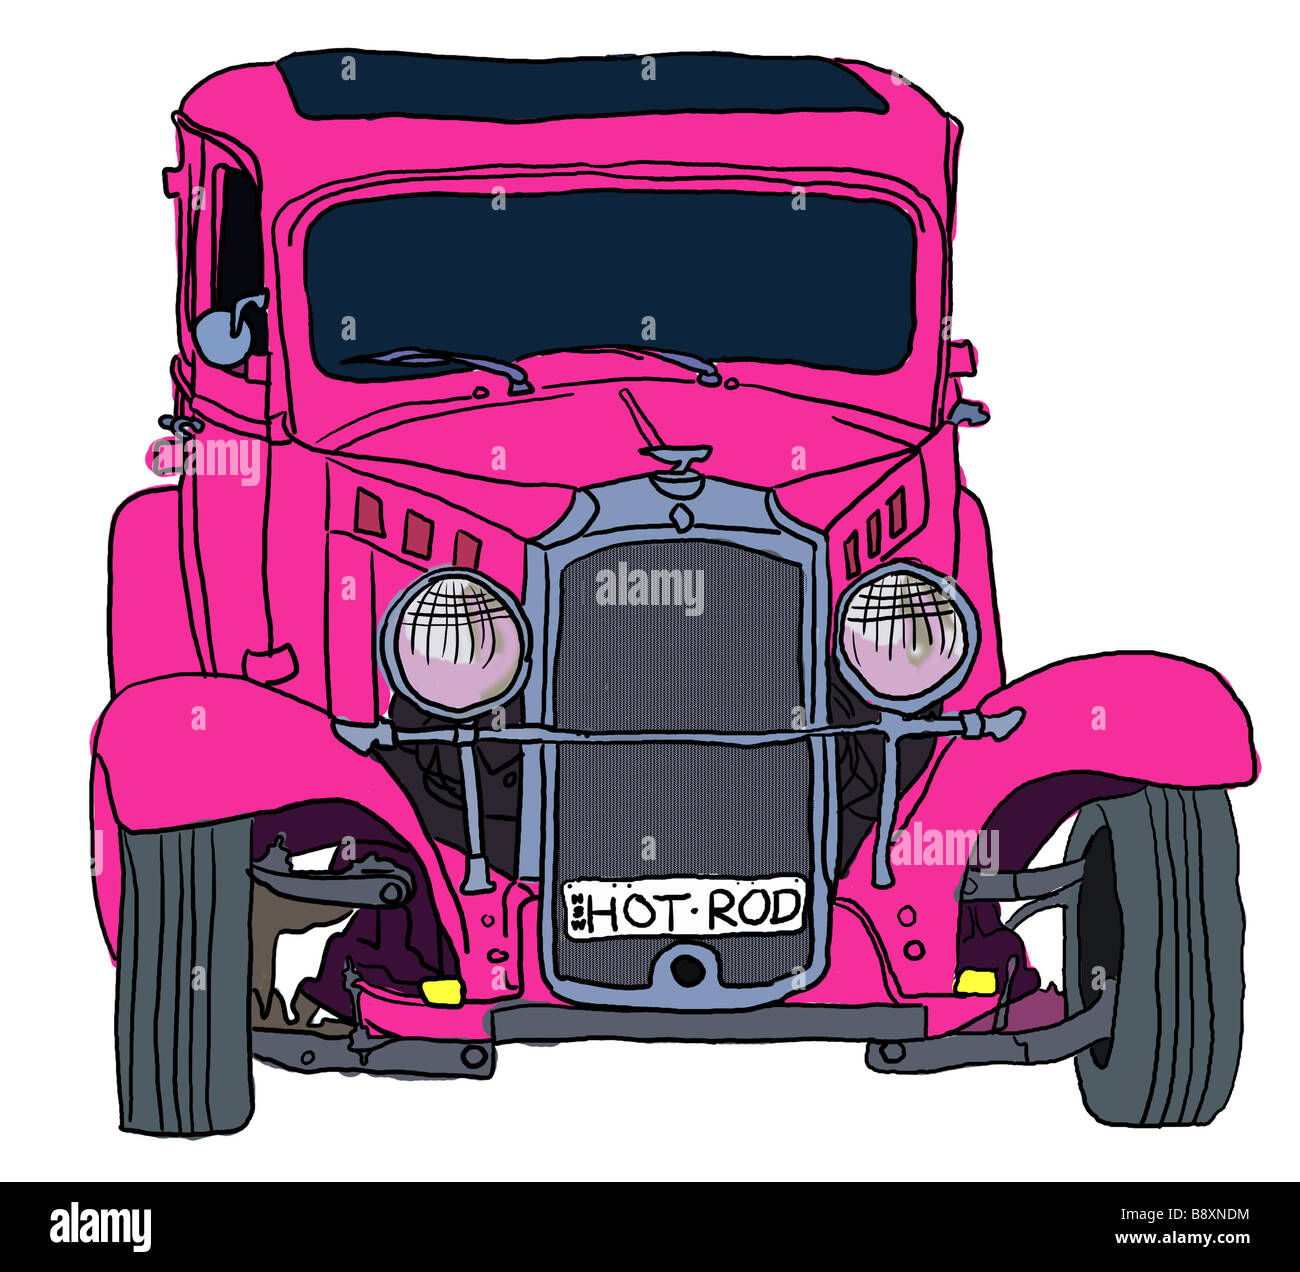 Illustration of Pink Hot Rod Stock Photo